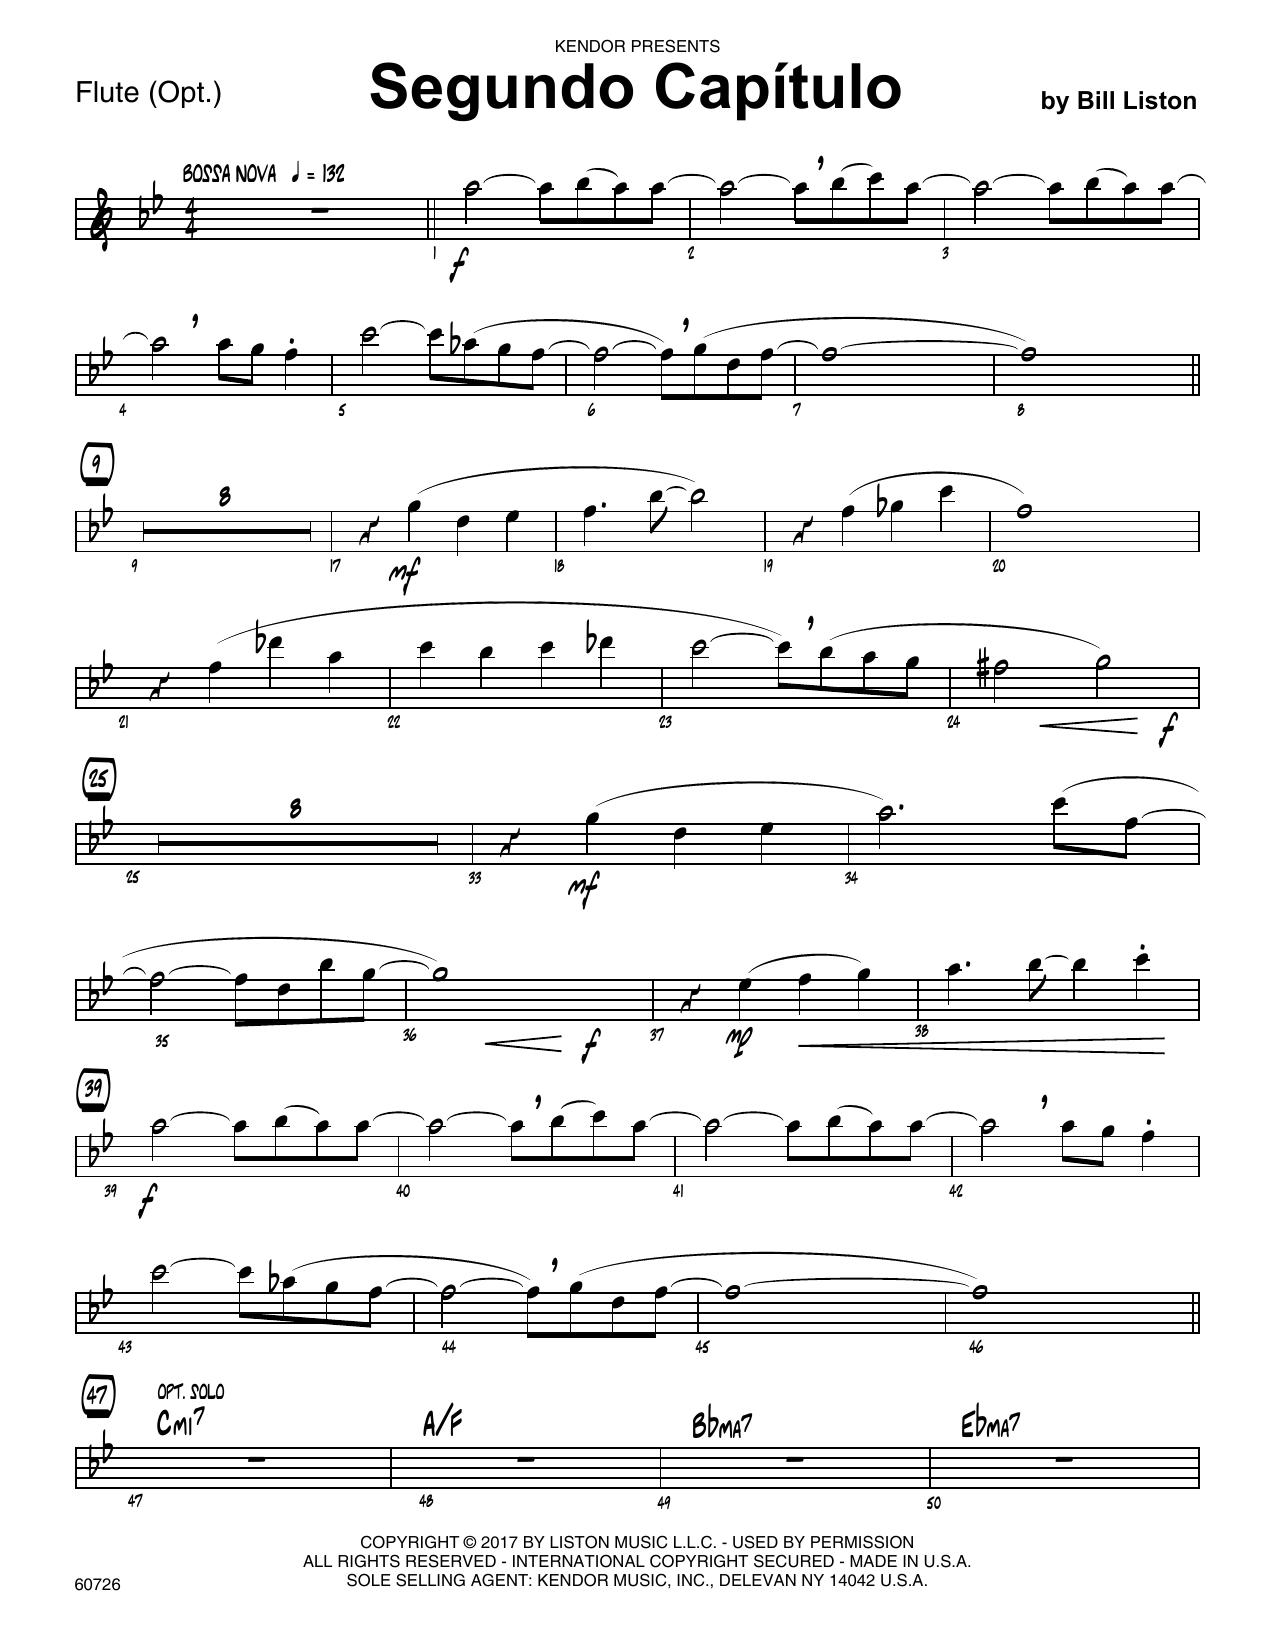 Bill Liston Segundo Capitulo - Flute sheet music notes printable PDF score